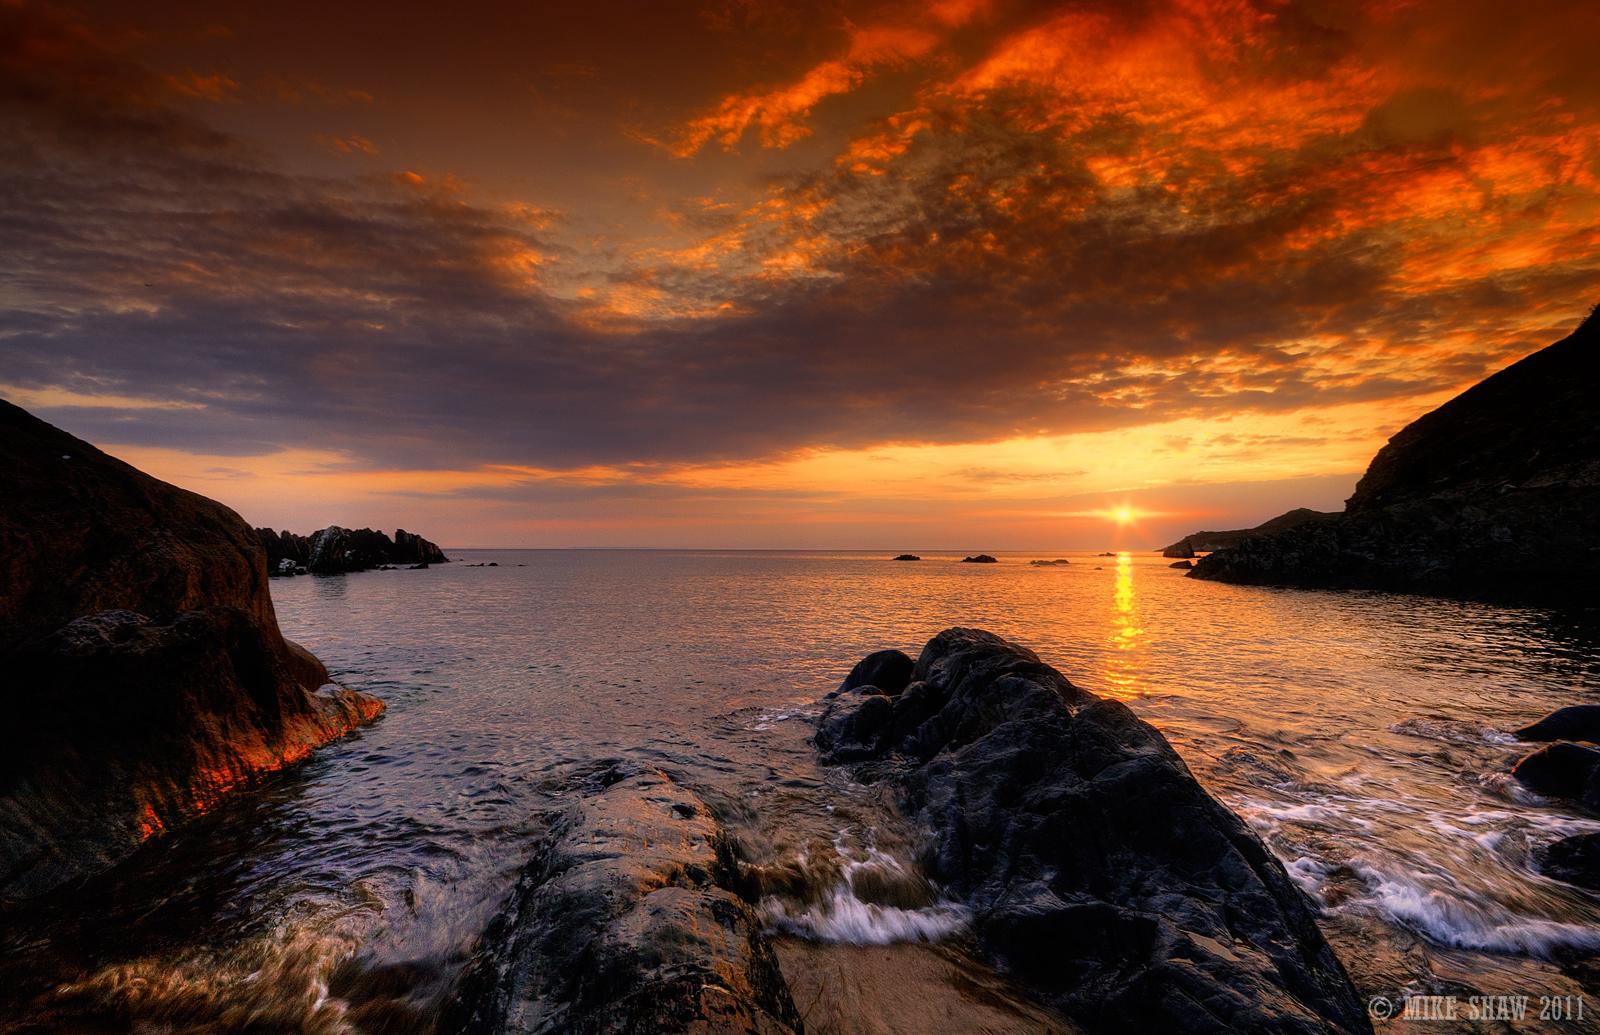 http://1.bp.blogspot.com/-P7kDDK3xzbw/UEX_qQMSD2I/AAAAAAAAELE/qegHcAfpmn0/s1600/Last-Sunset.jpg